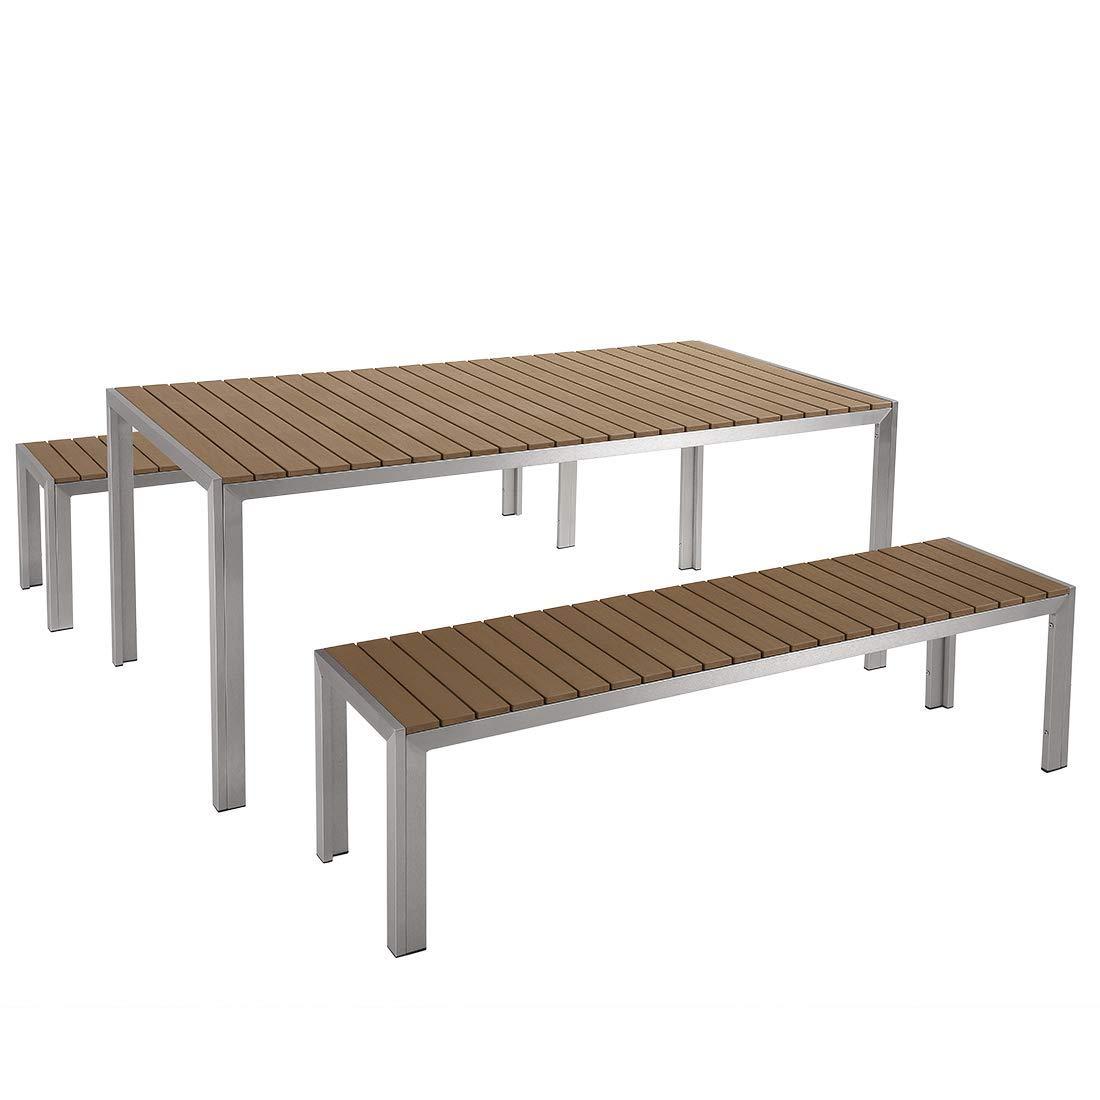 Beliani Gartenmöbel Set Aluminium Kunstholz braun 8-Sitzer Nardo